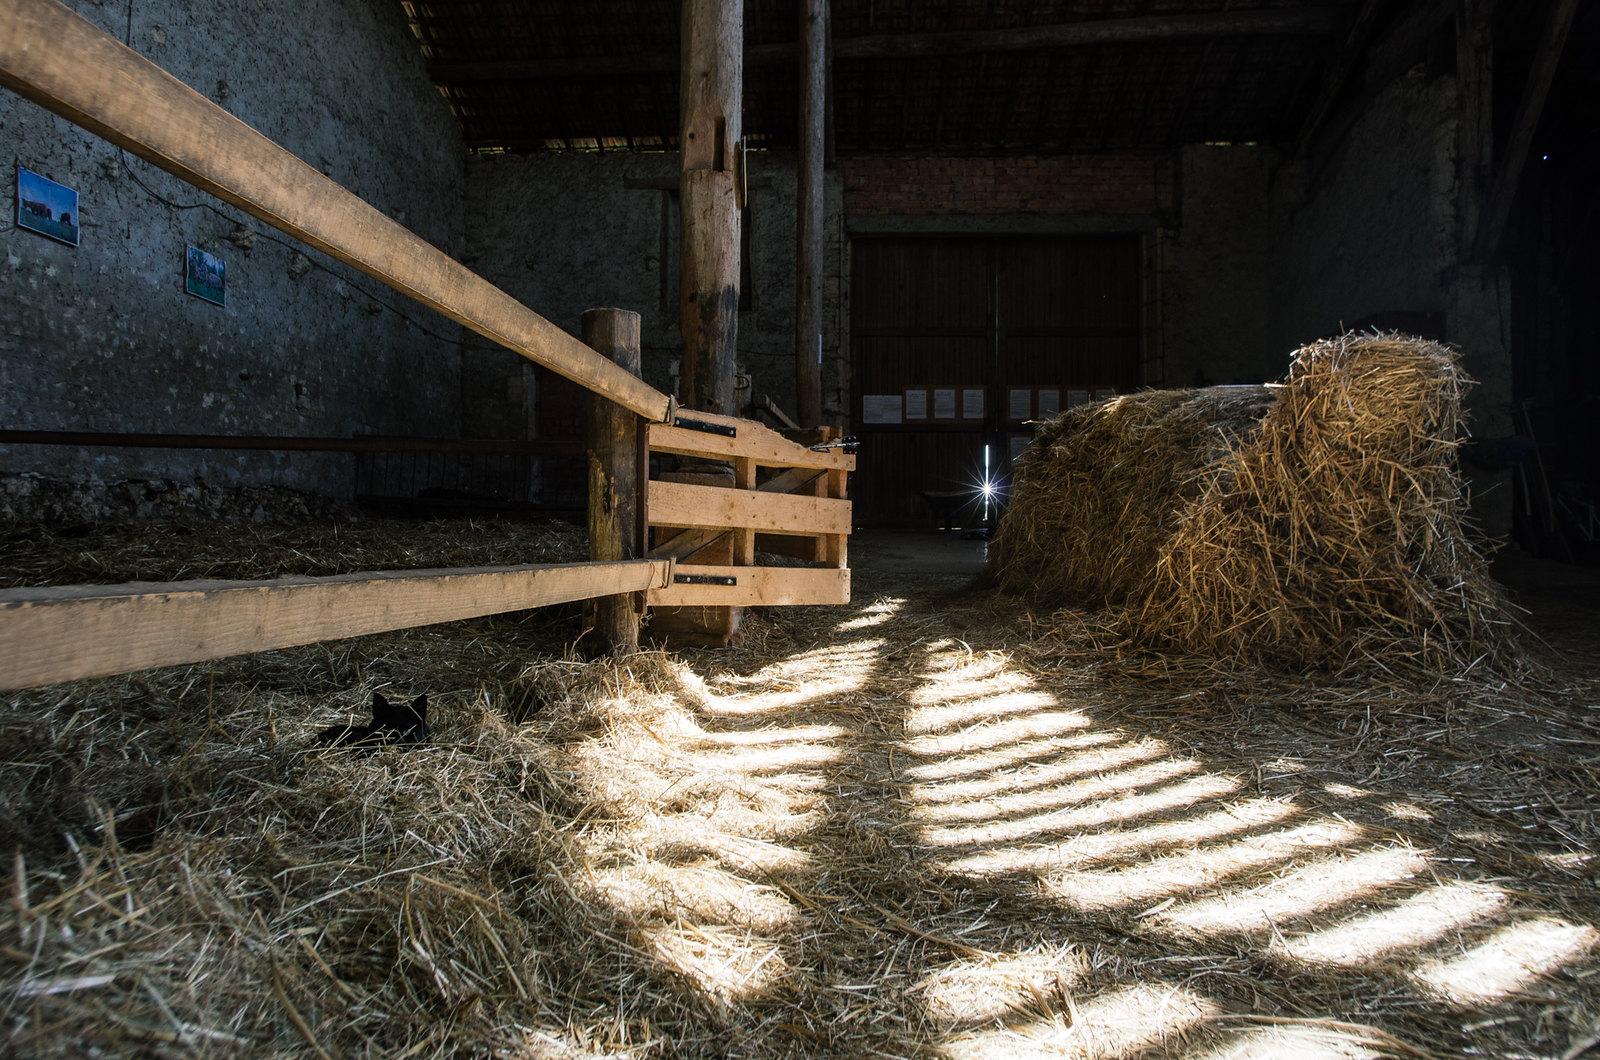 Randonner en Argonne - Balade en ânes - Dans la grange